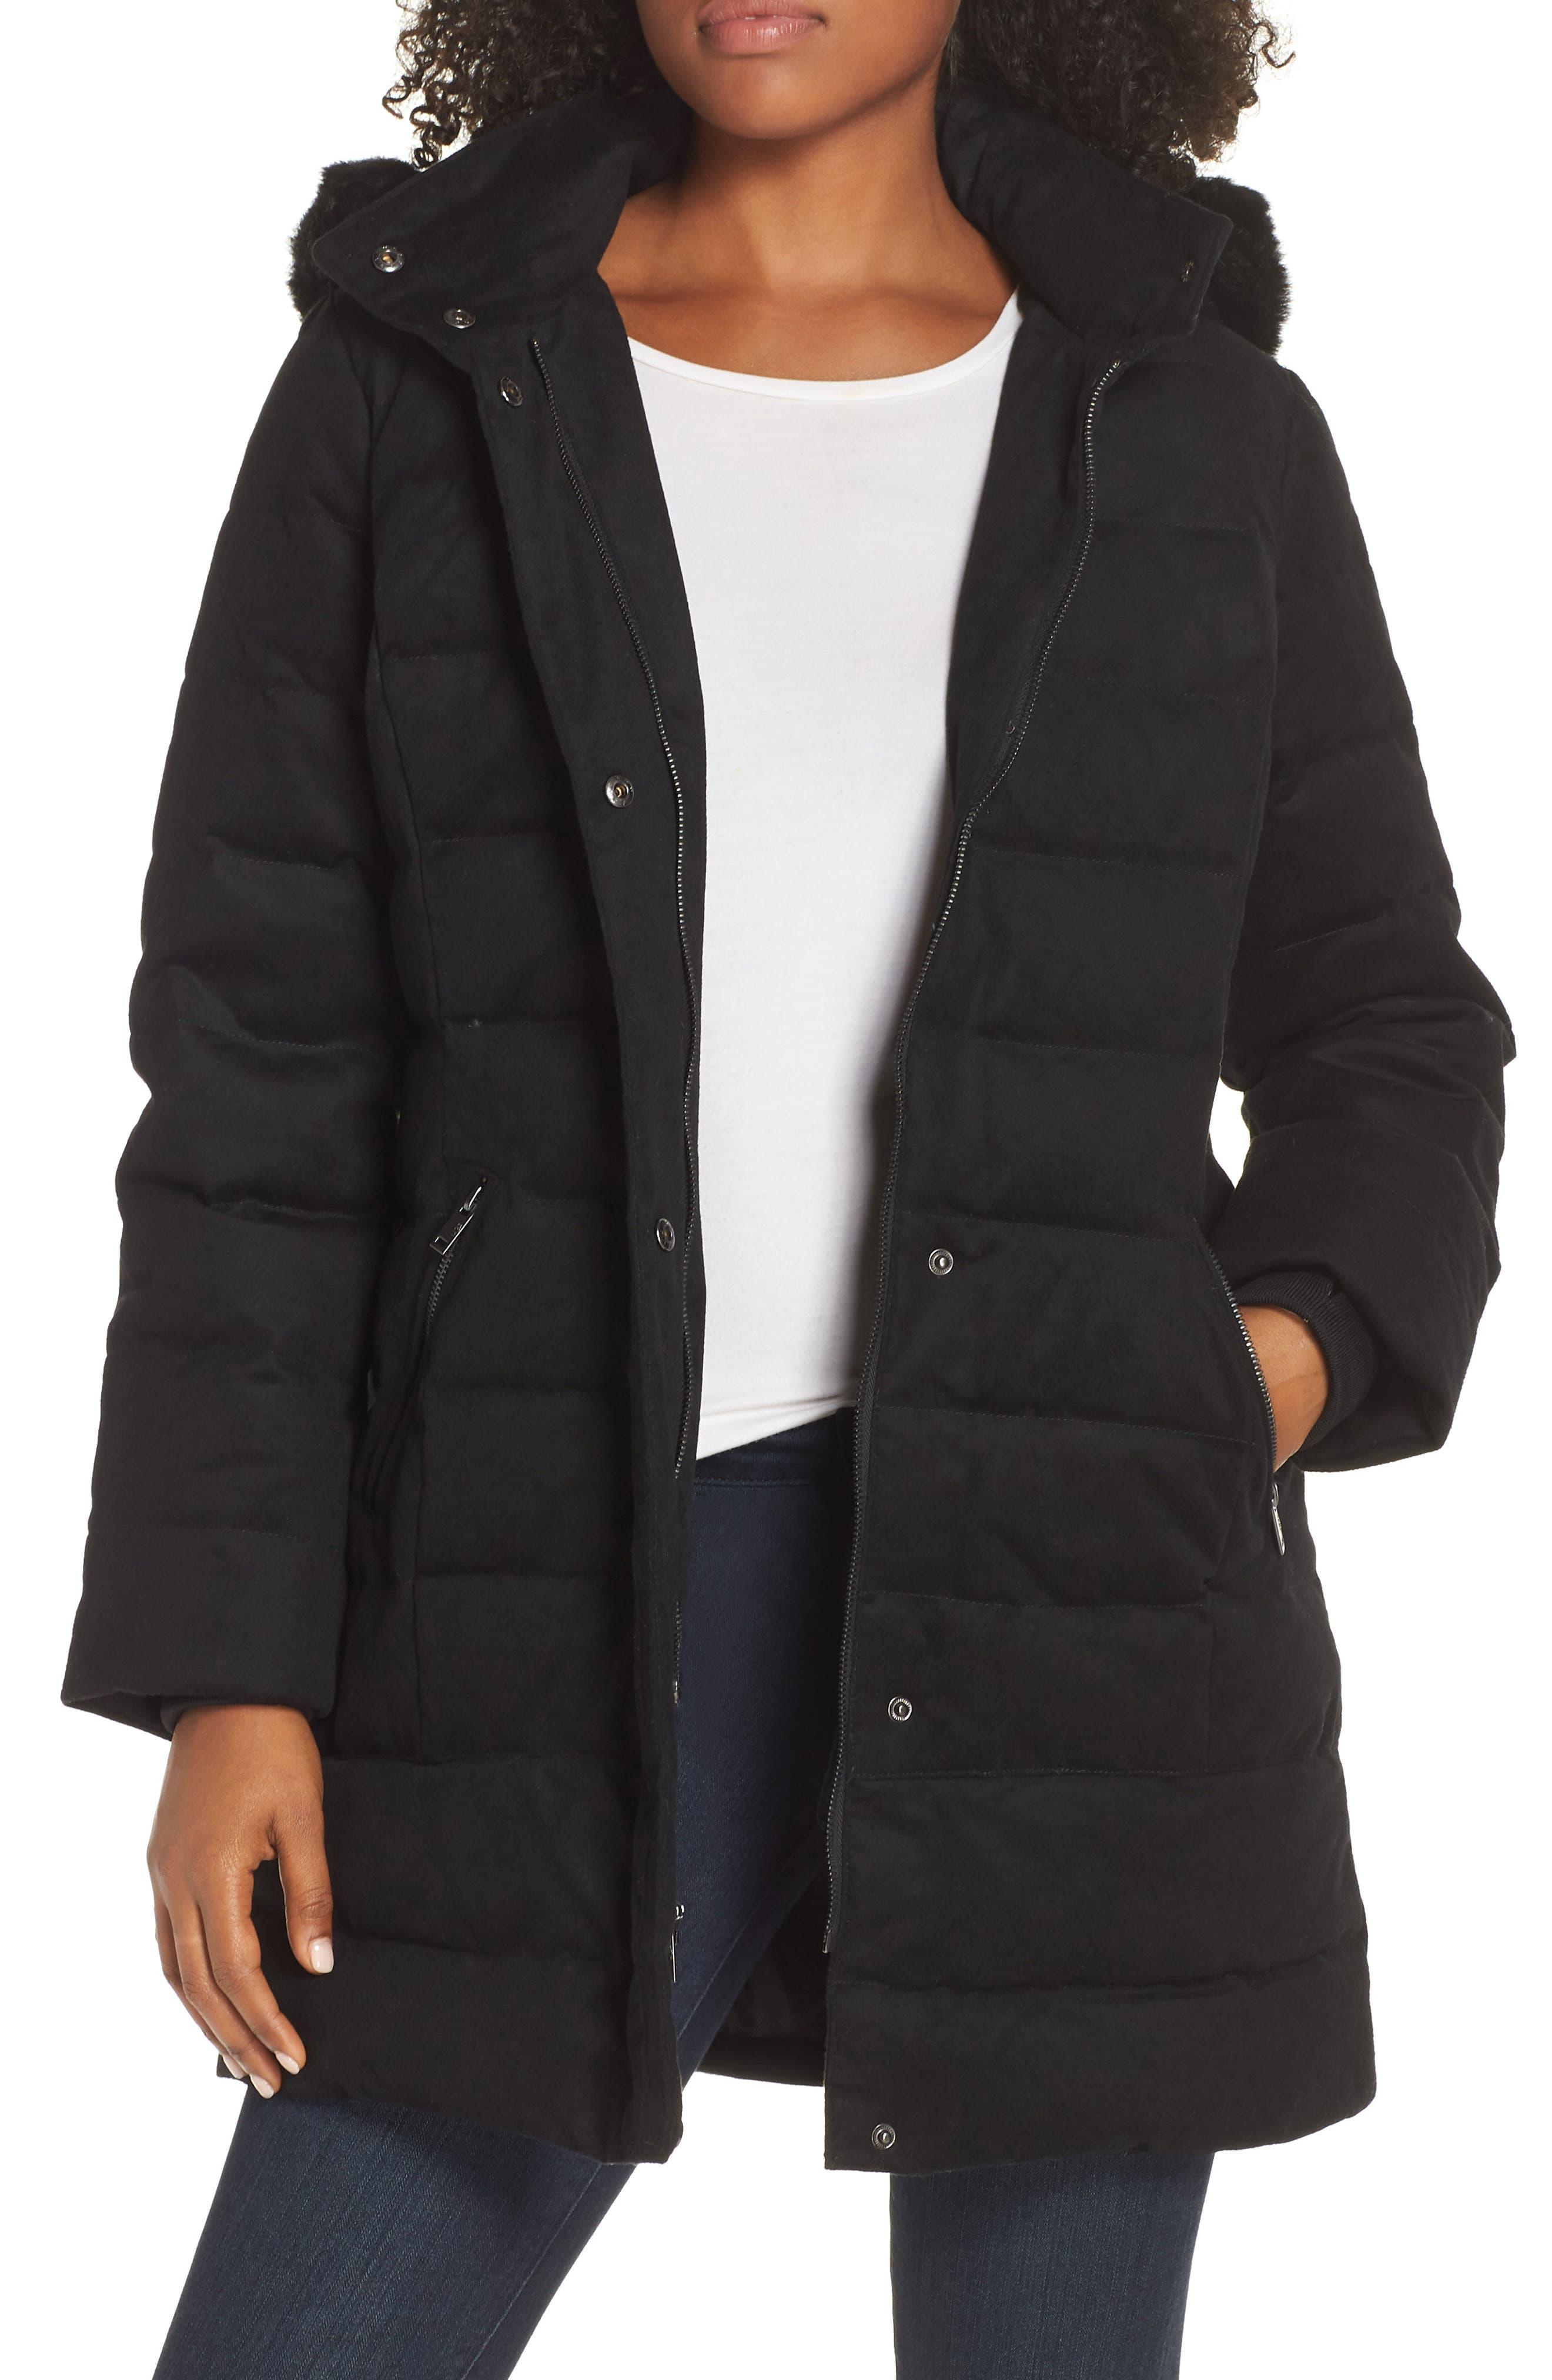 Celeste Genuine Shearling Trim Down Coat,                         Main,                         color, BLACK